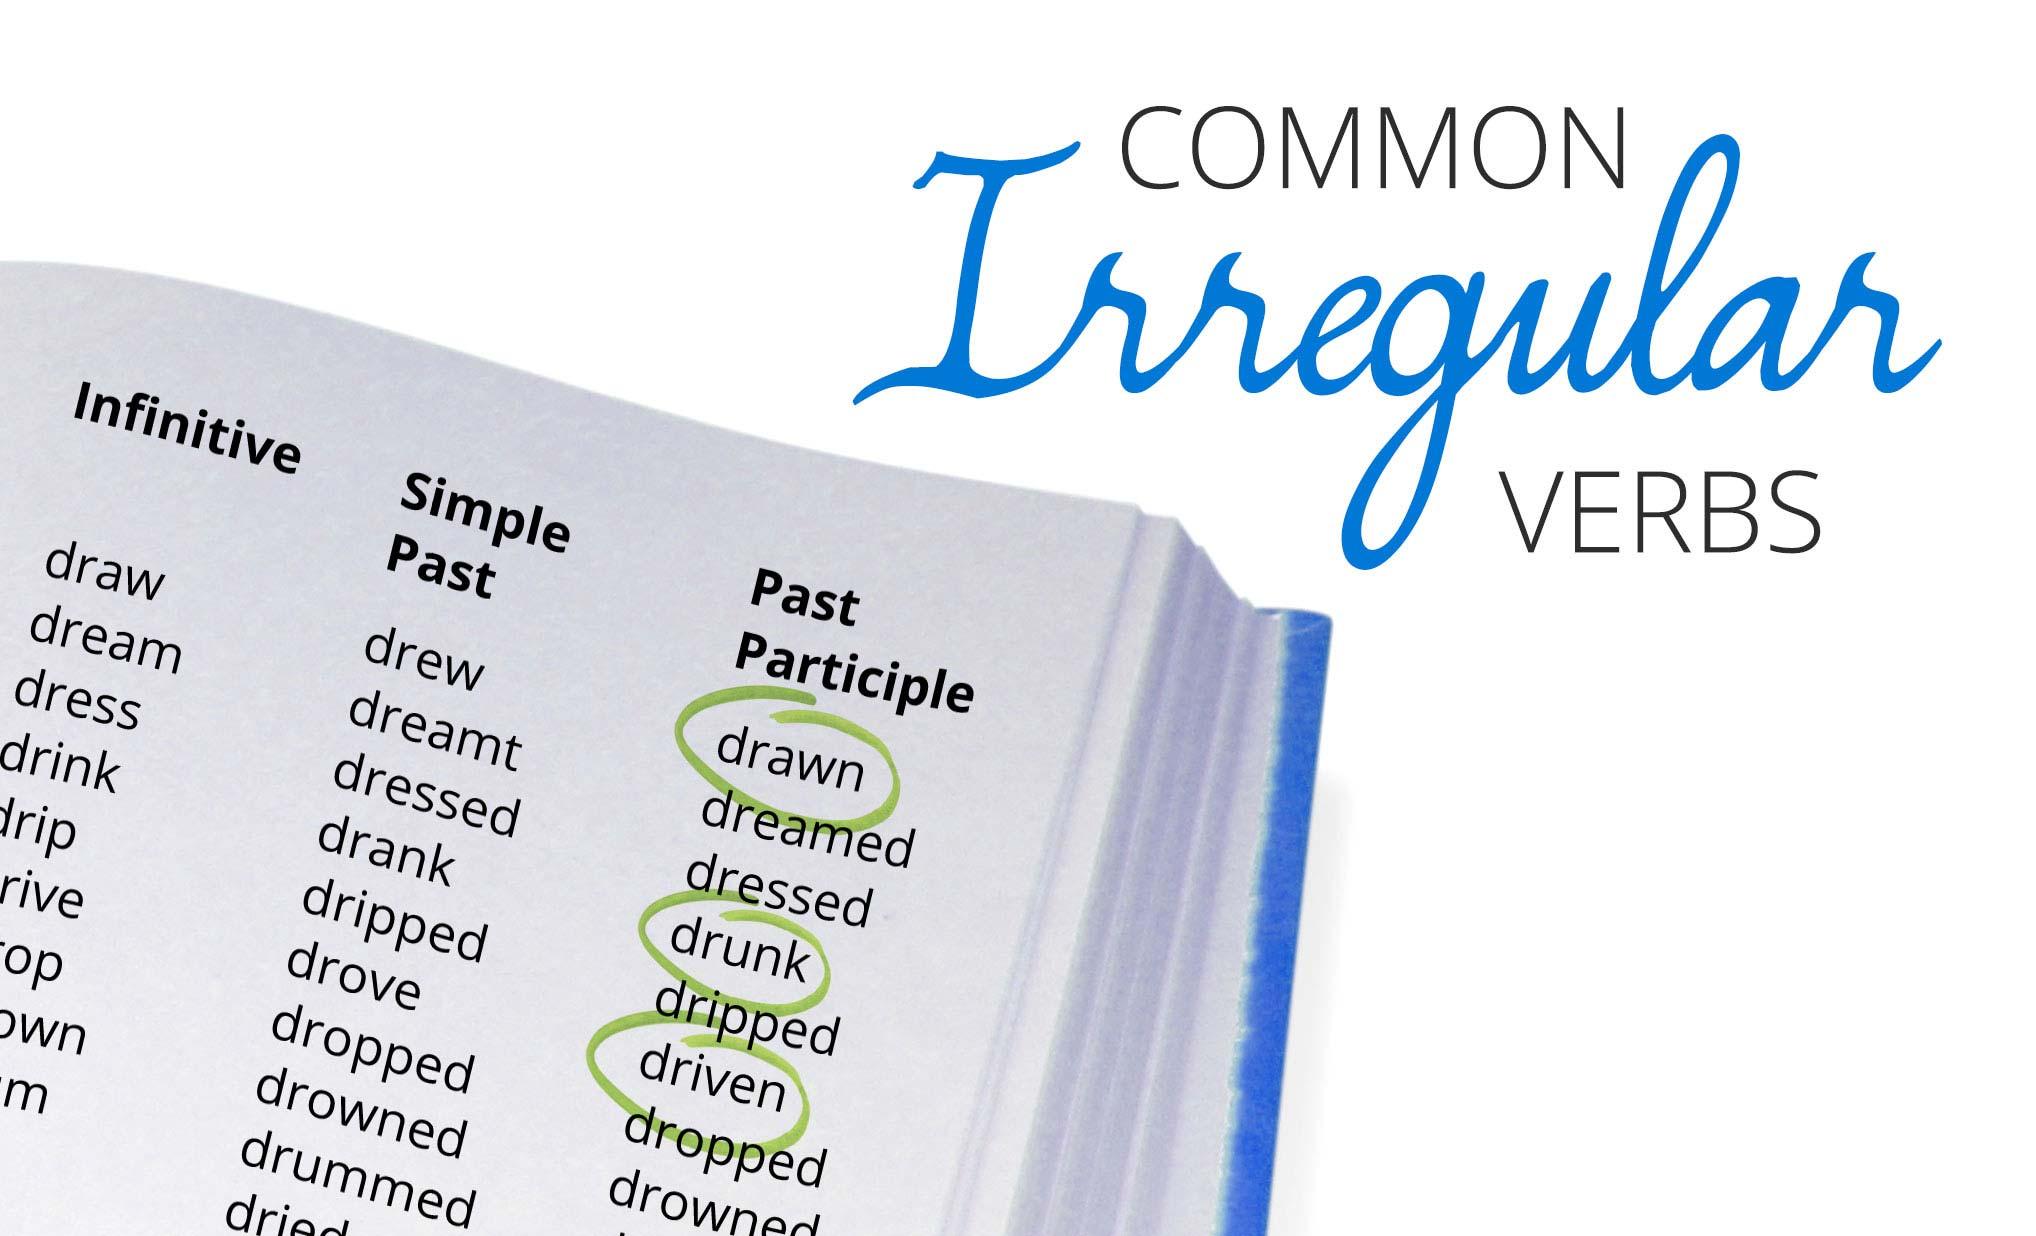 Irregilar Verbs List